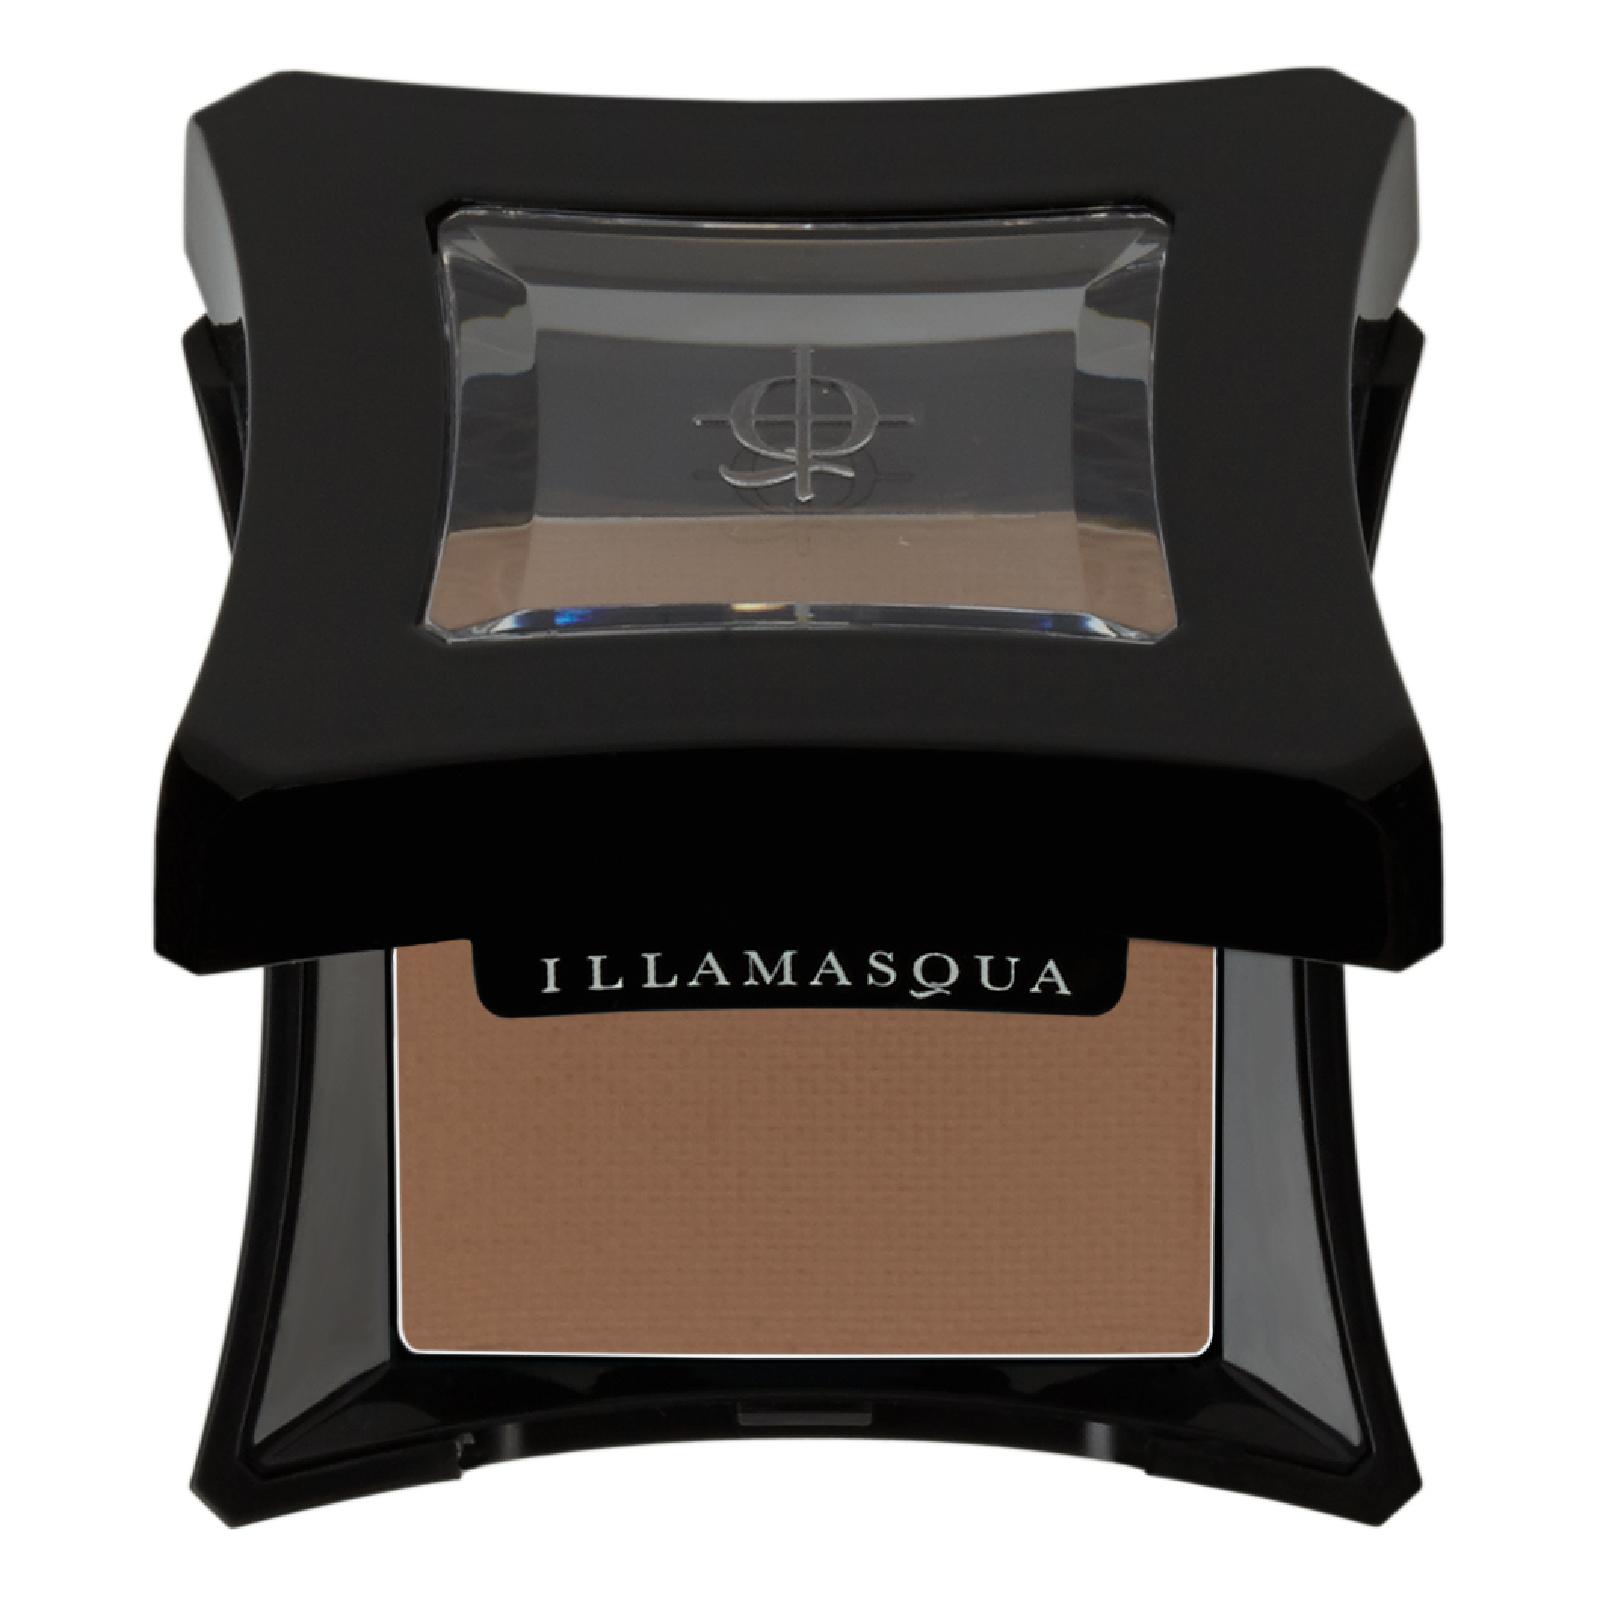 Illamasqua Powder Eye Shadow 2g (Various Shades) - Heroine